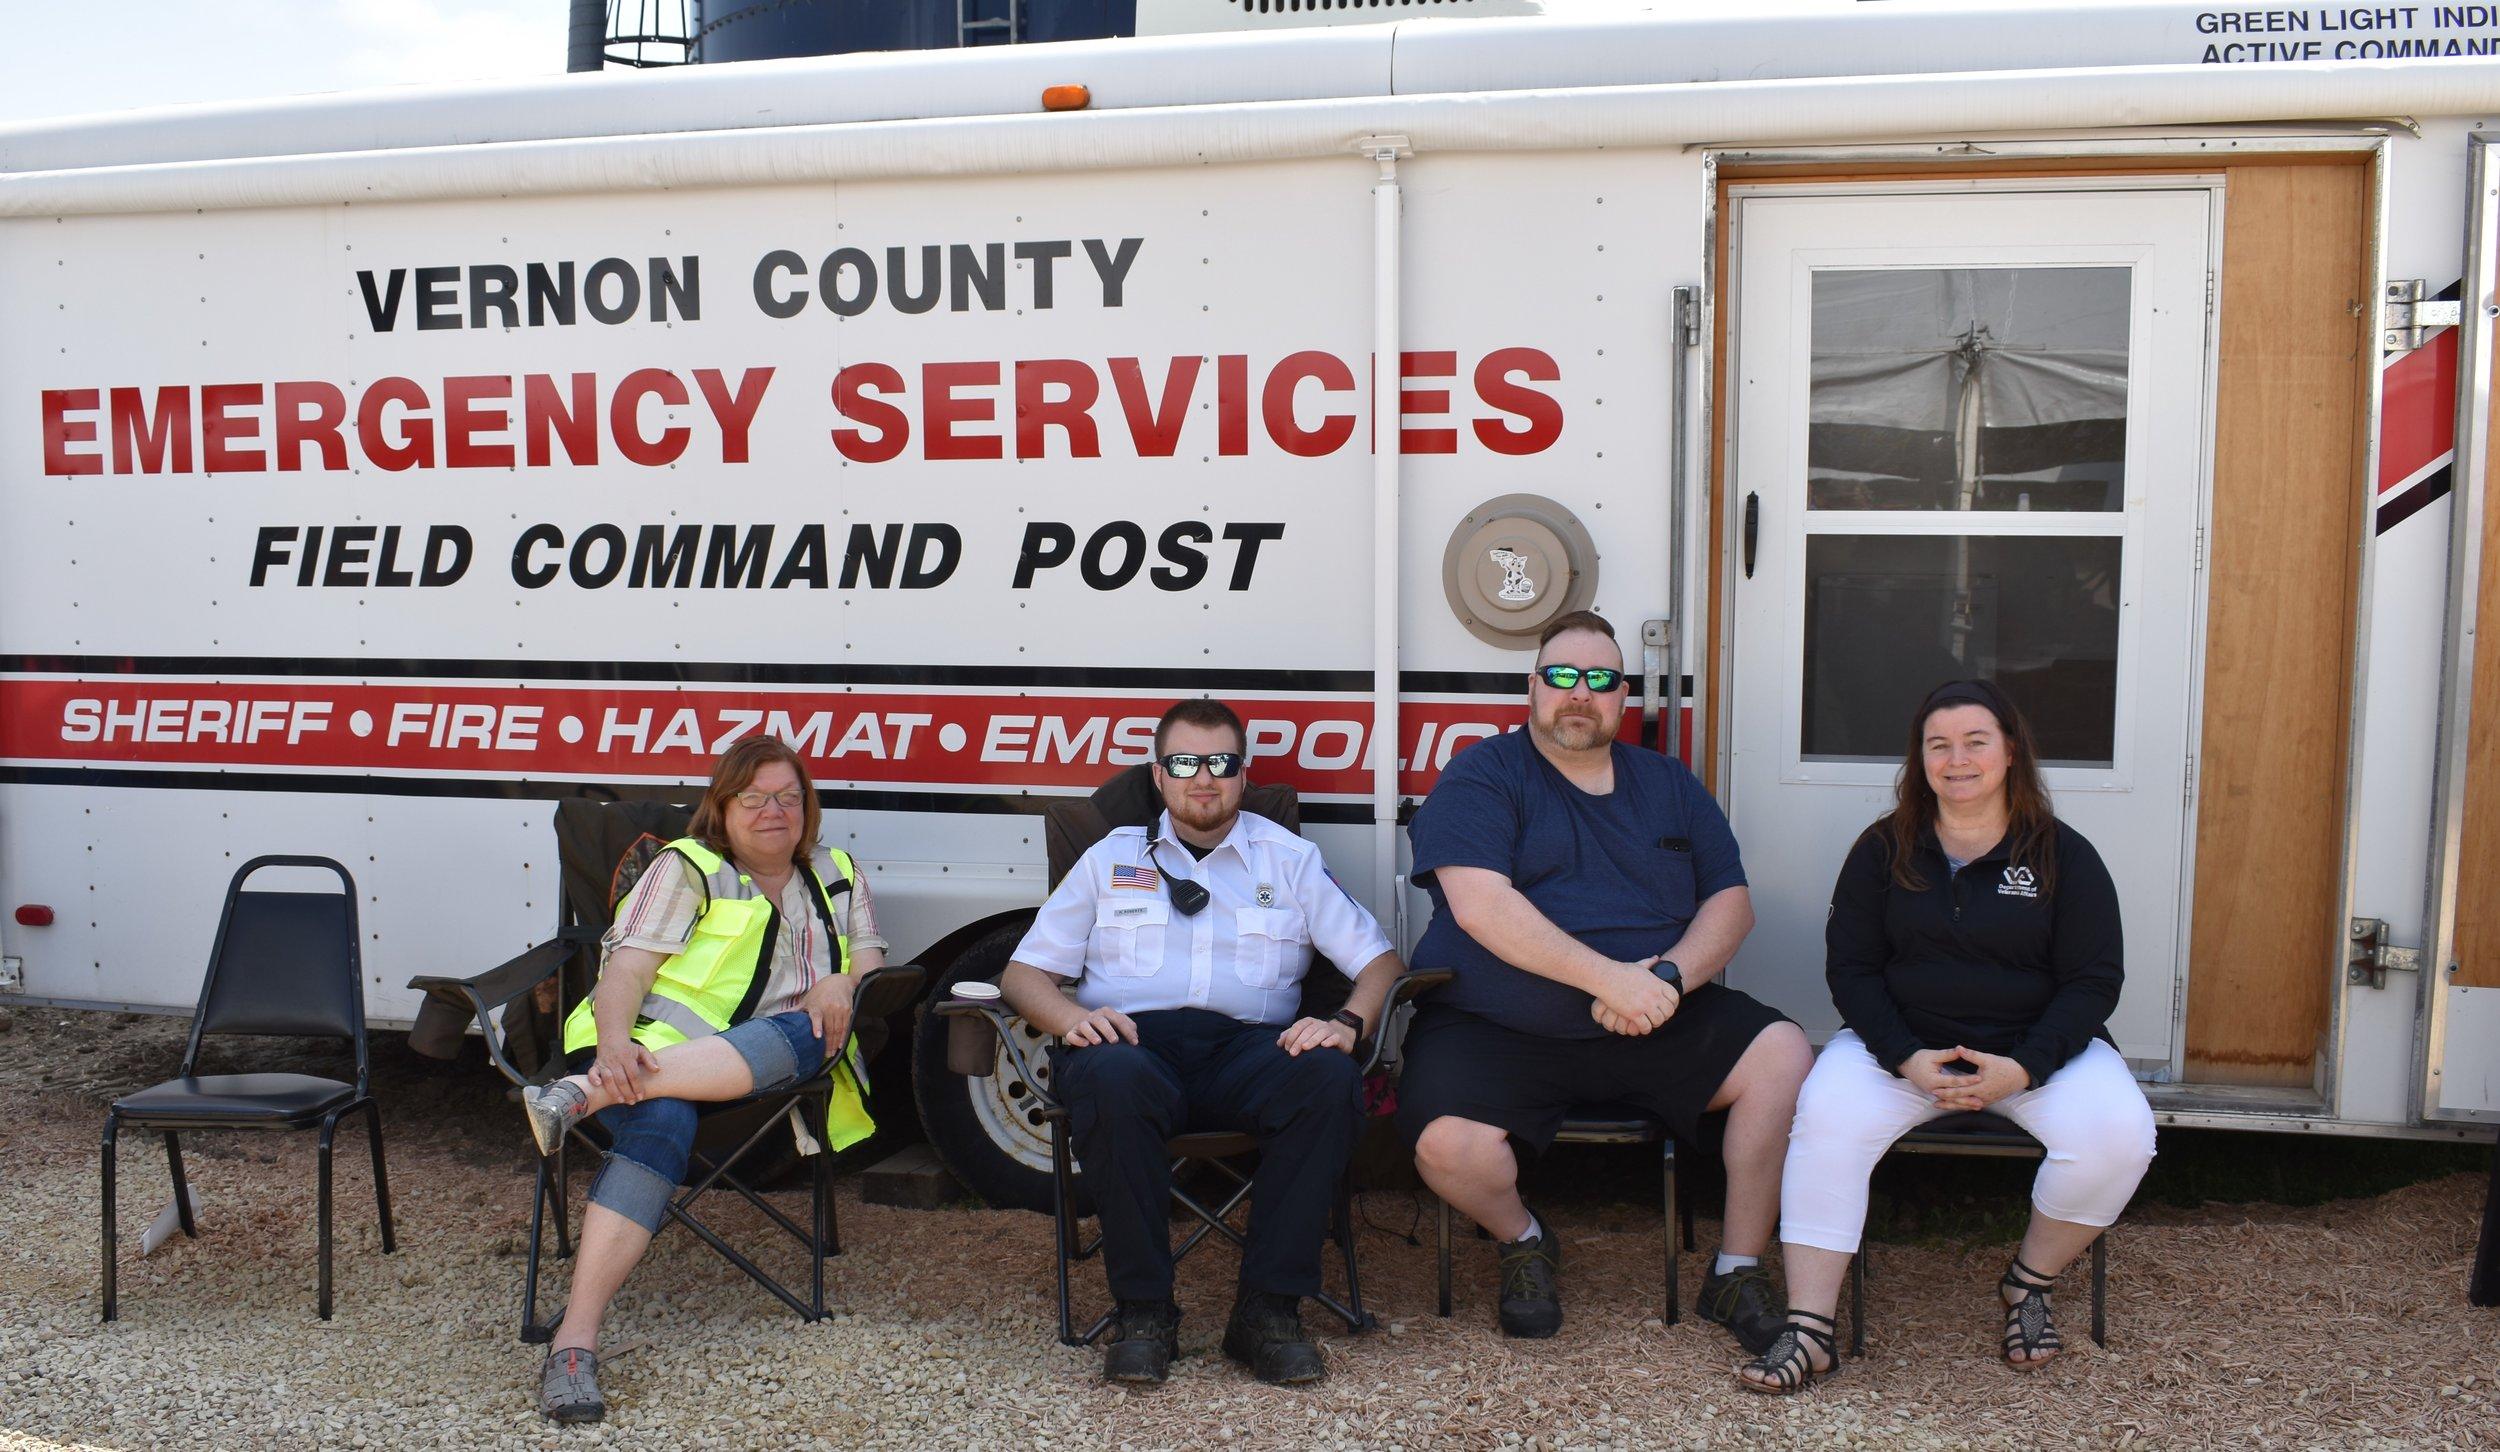 EMS members L to R- Cindy Lindvig, Hunter Roberts, Patrick Brannan, and Mona Balsdon